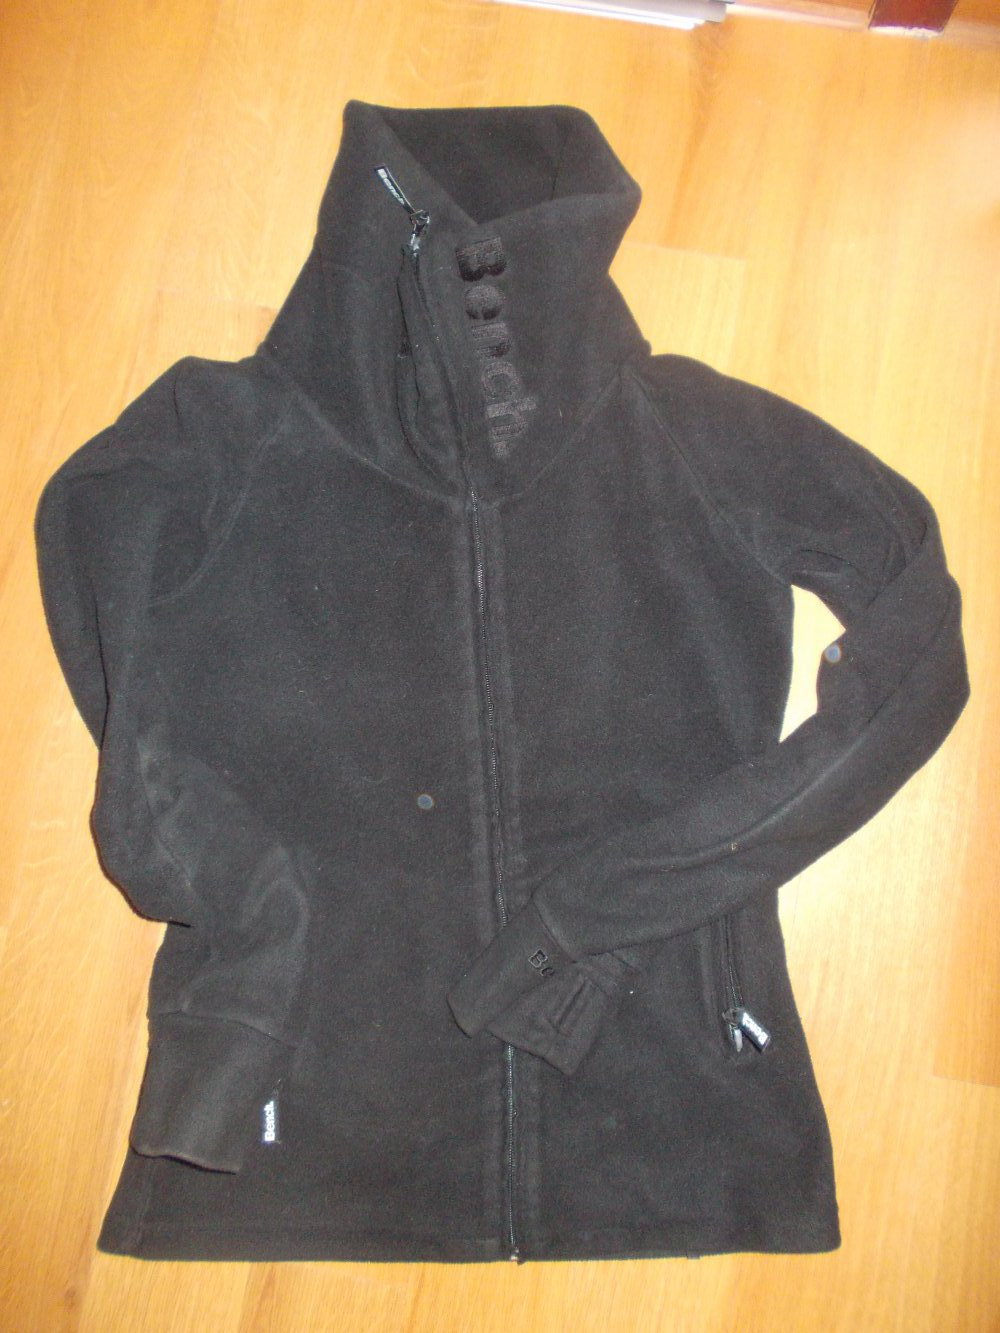 b8626c146c15b Bench Fleecejacke hoher Kragen schwarz Größe M :: Kleiderkorb.de